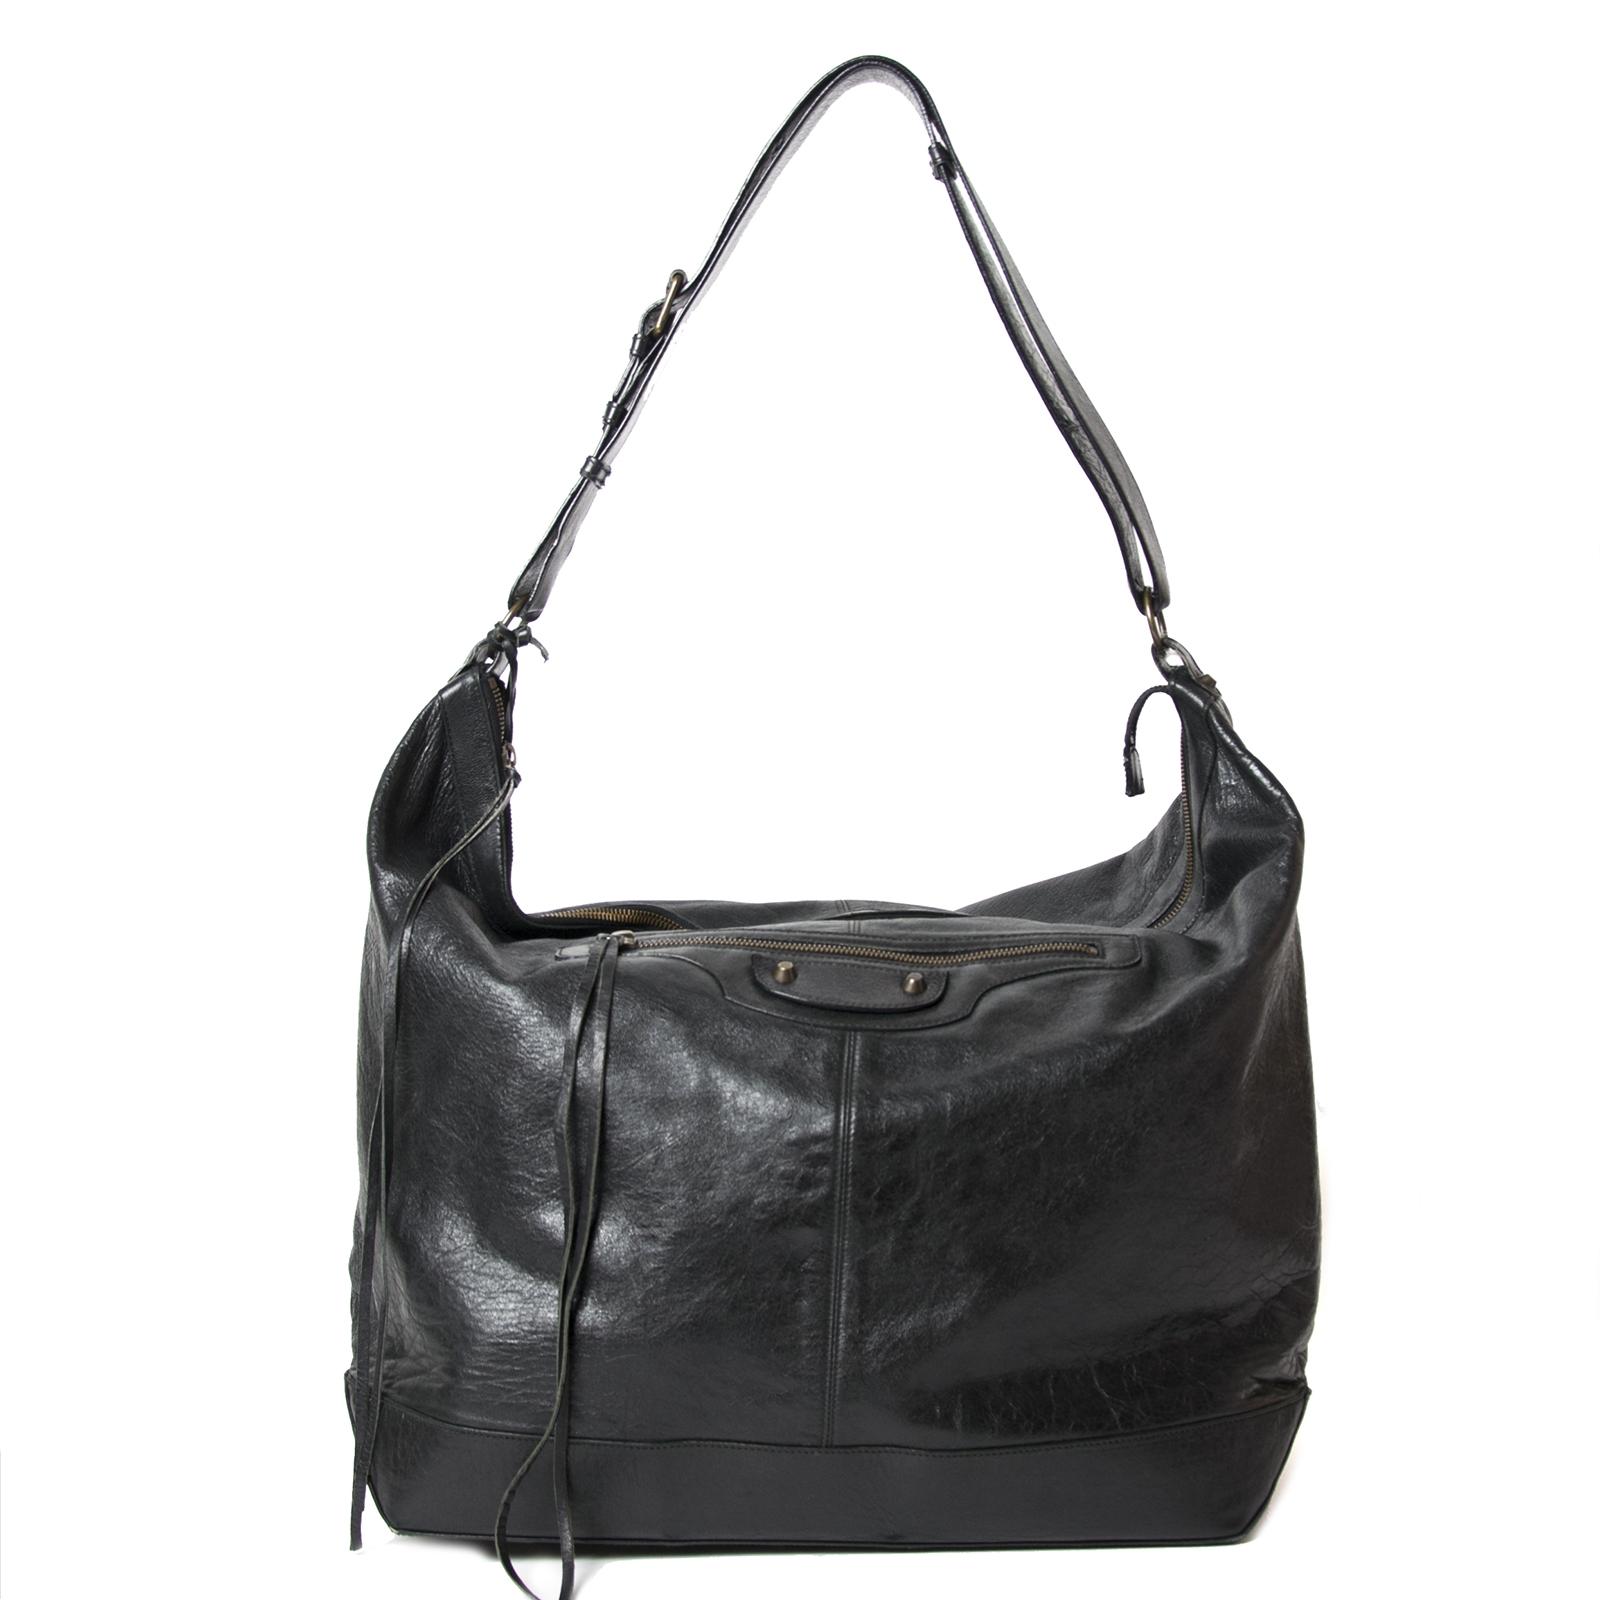 Buy your authentic Balenciaga Black Courier Bag for the best price at Labellov kopen en verkopen